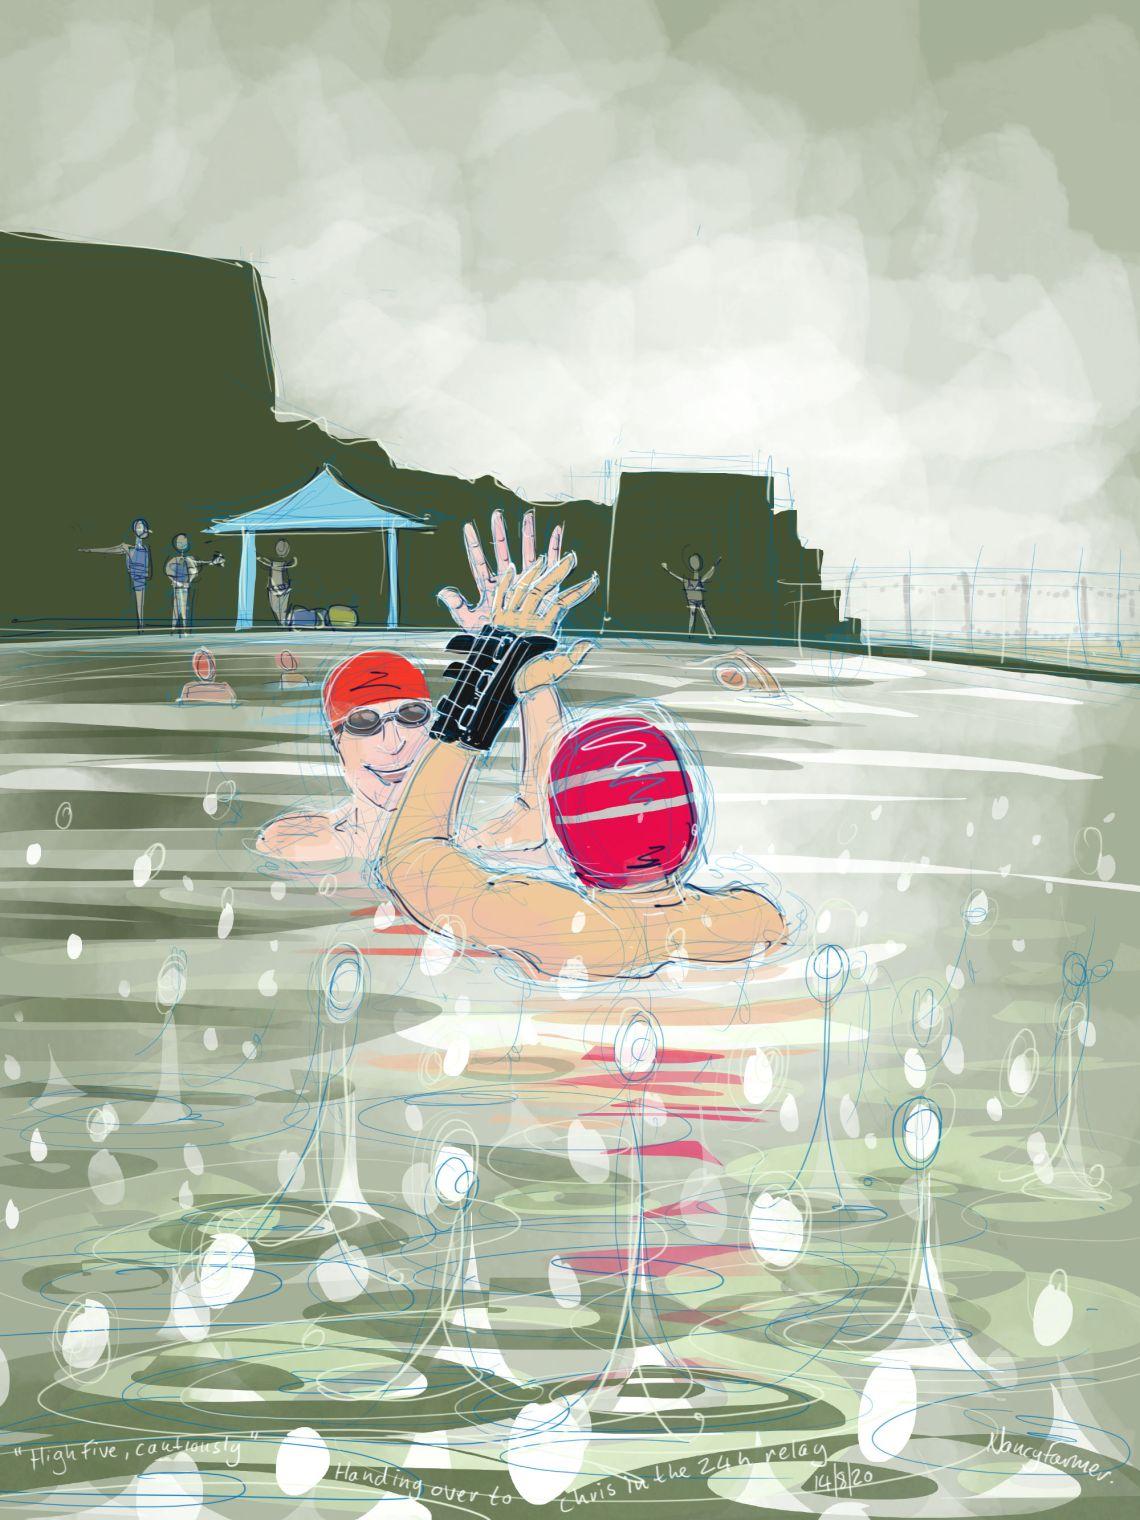 """High Five. Cautiously"" - digital drawing by Nancy Farmer"